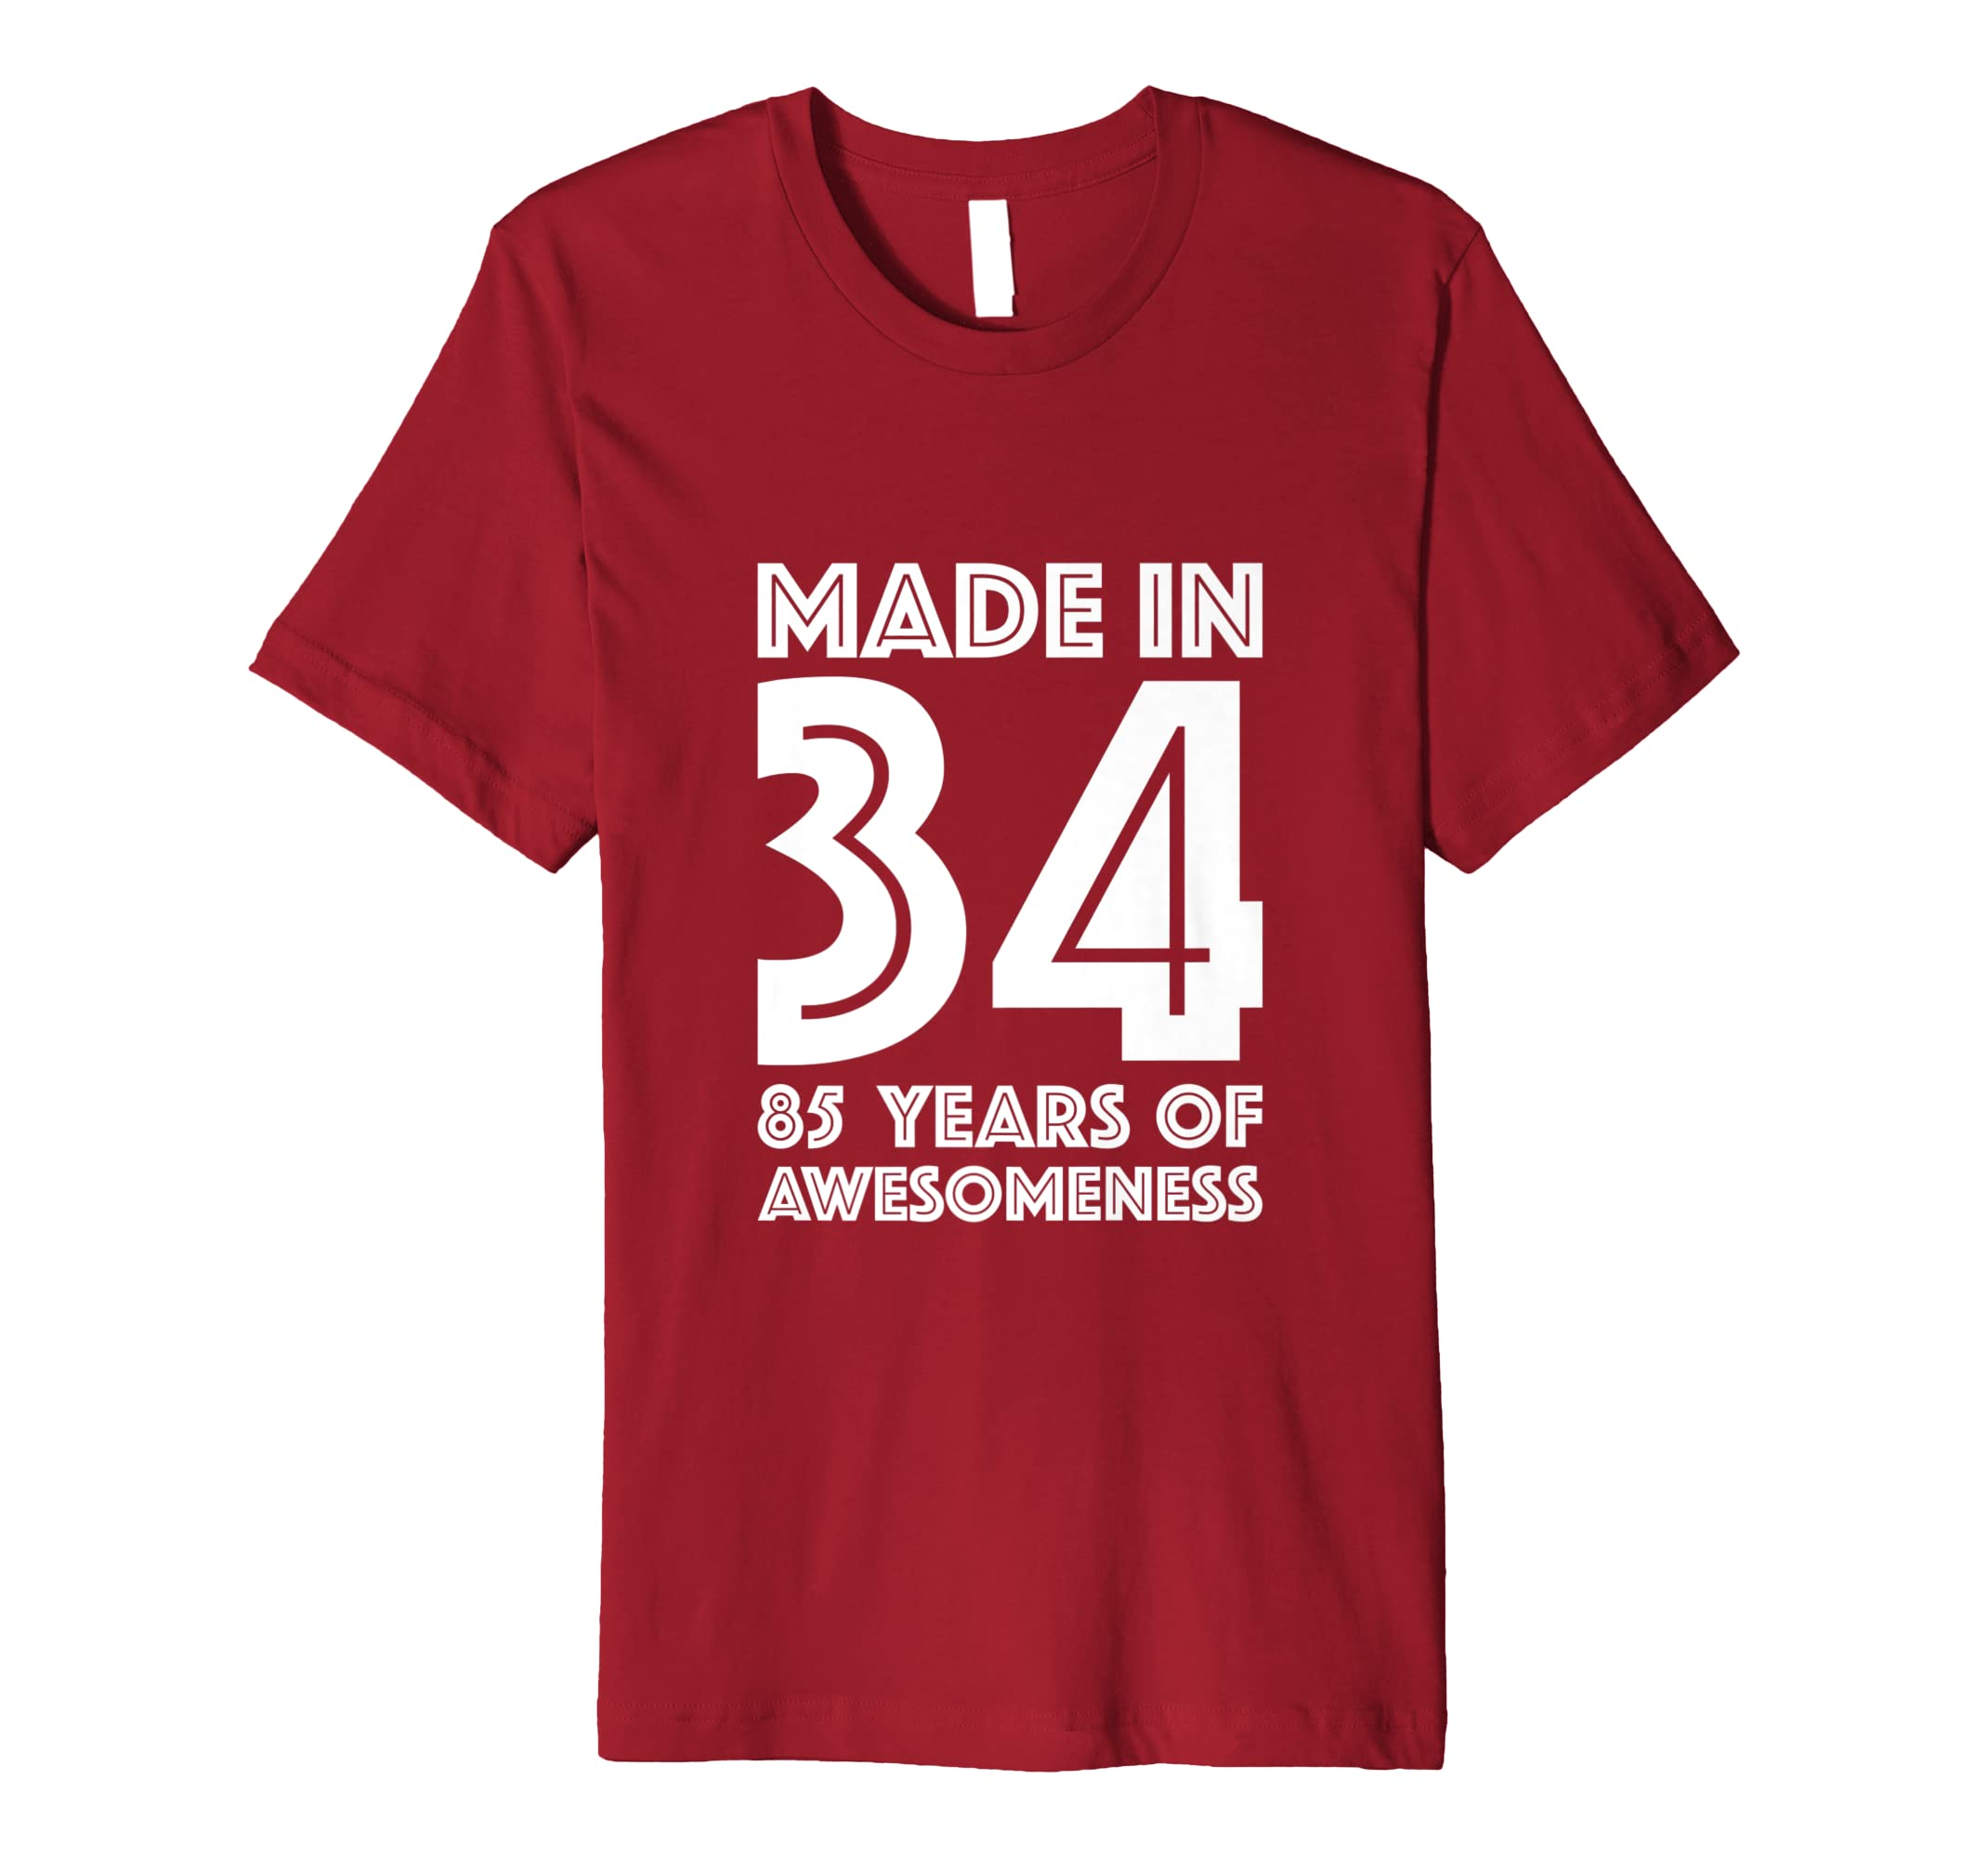 Amazon 85th Birthday Tshirt For Grandpa Men Gifts 85 Year Old Dad Clothing